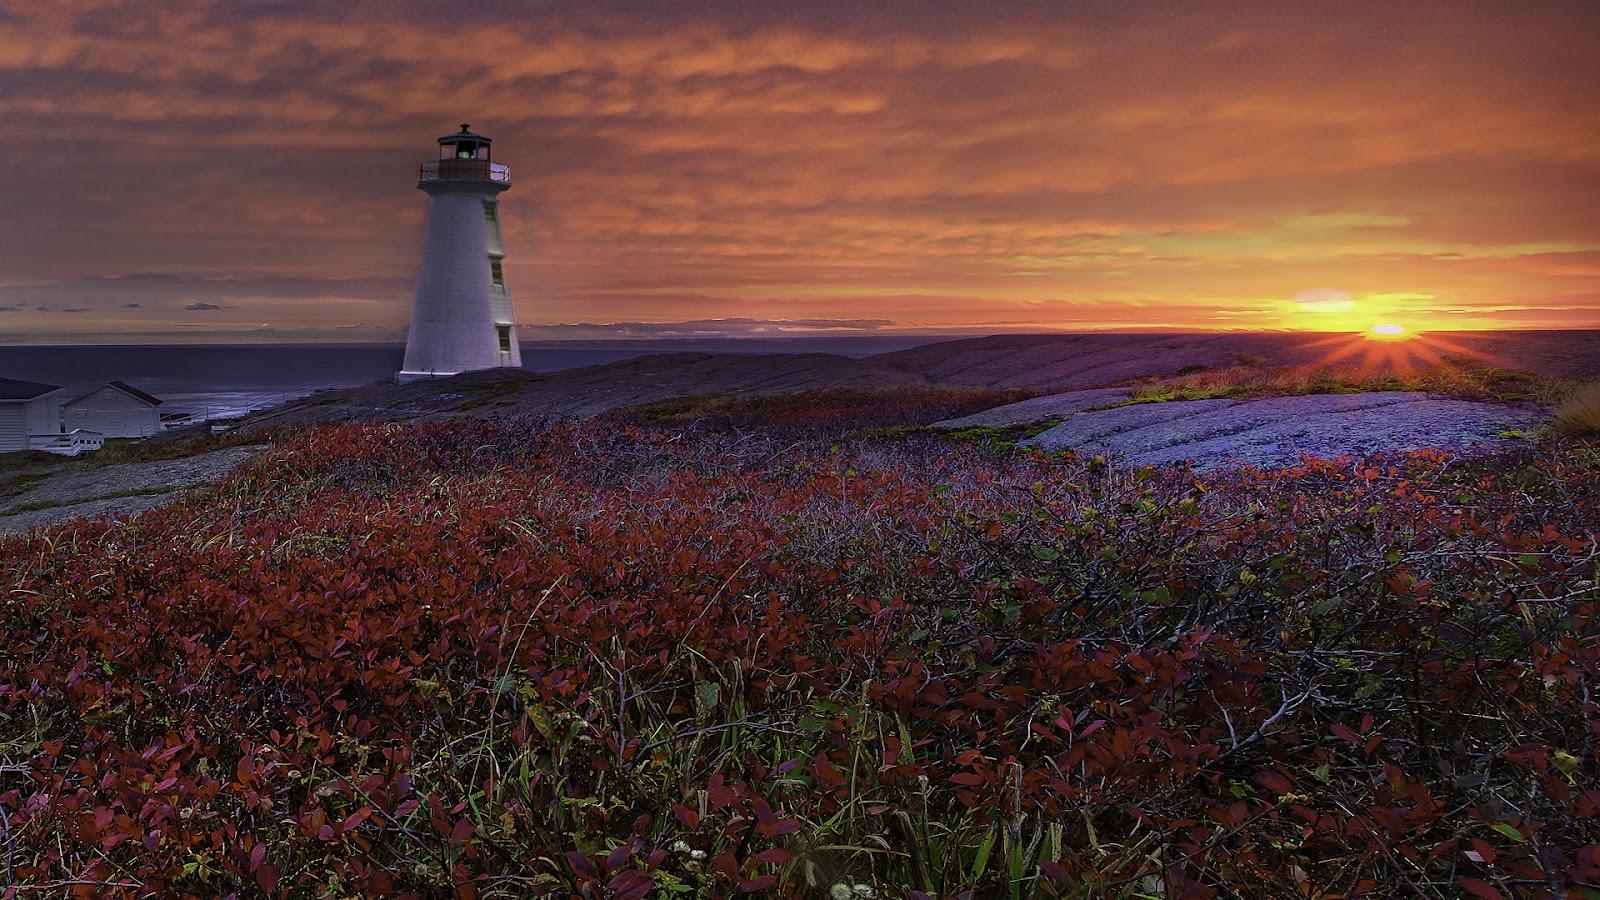 46] Newfoundland Lighthouse Wallpaper on WallpaperSafari 1600x900